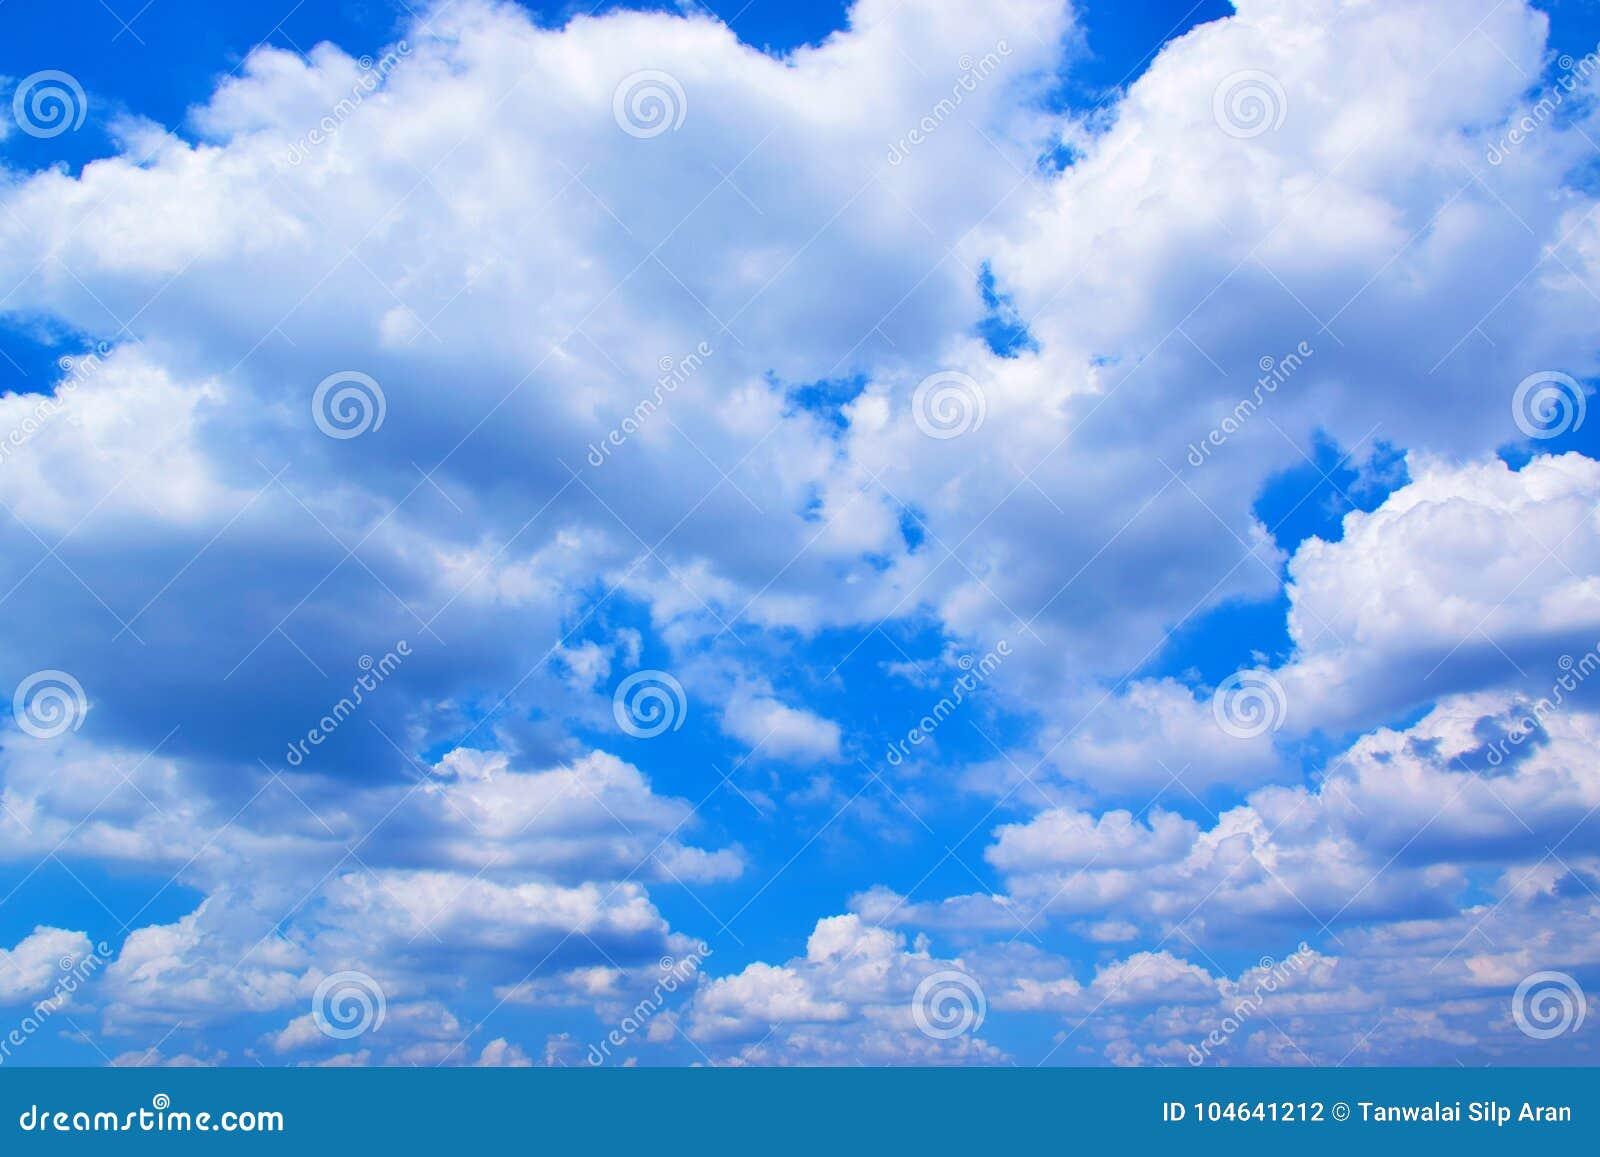 Download Blauwe Hemel En Wolkenachtergrond 171018 0173 Stock Foto - Afbeelding bestaande uit lucht, samenvatting: 104641212